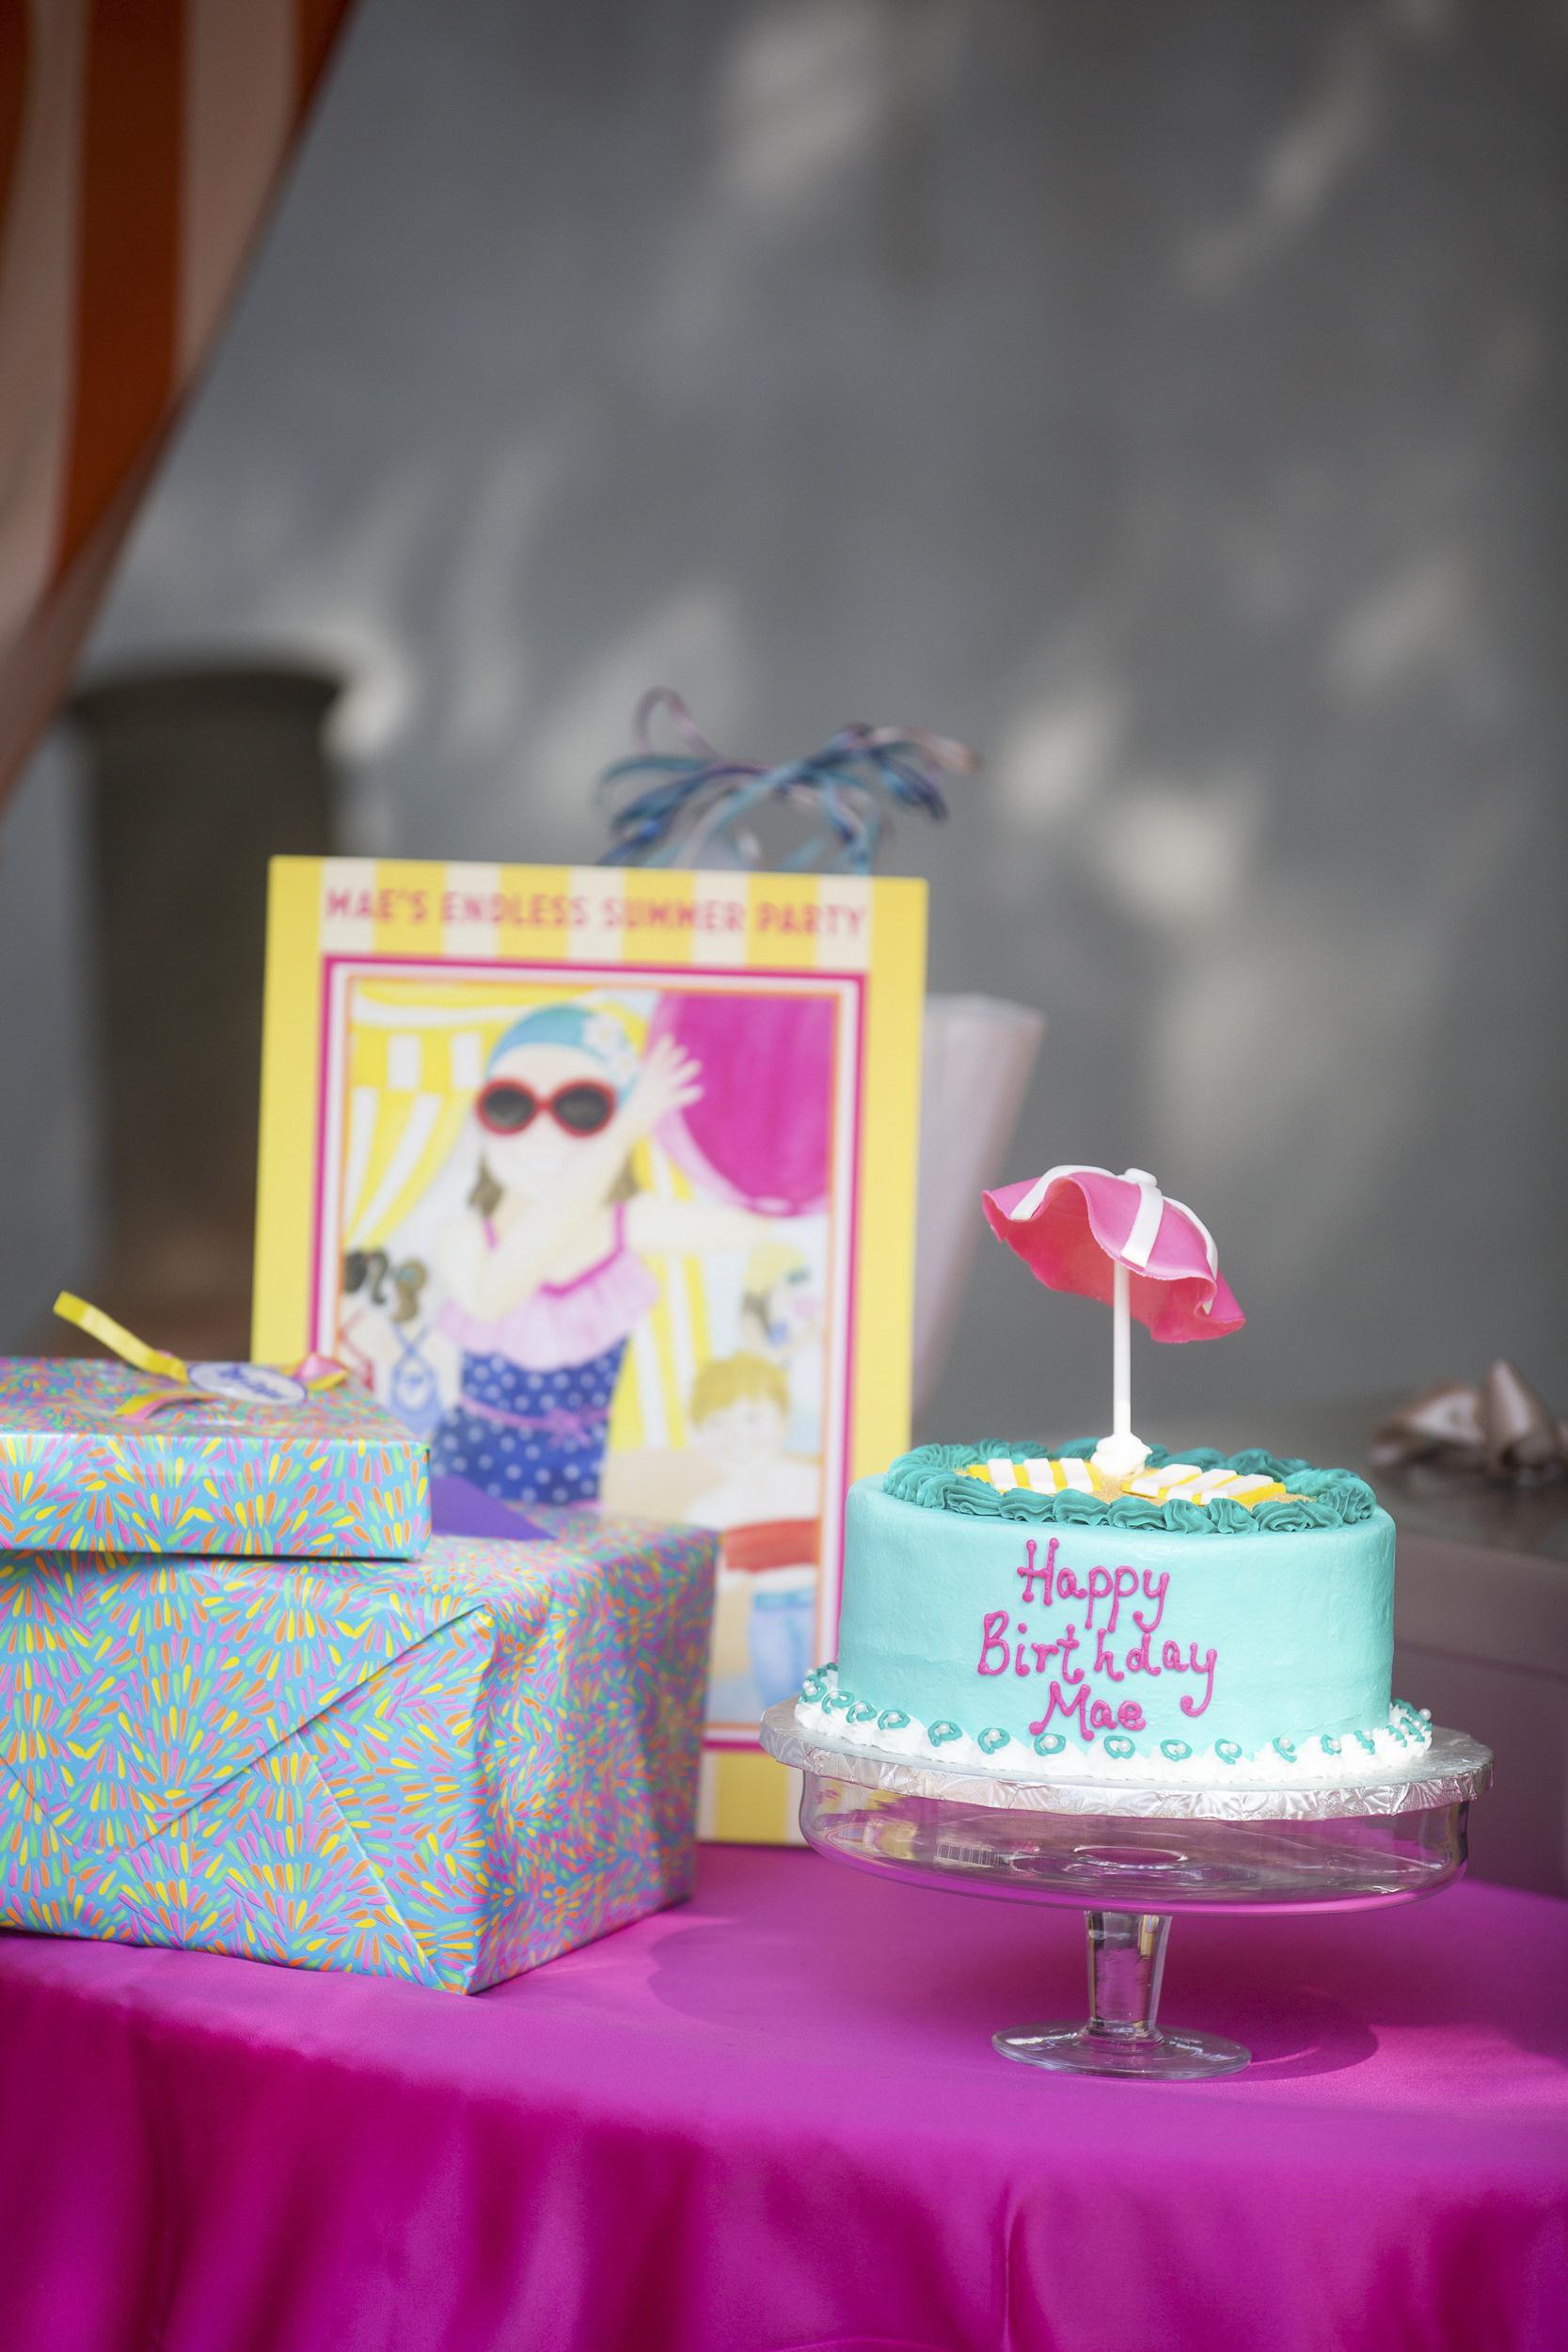 dallas_texas_birthday_party_mae_emily_clarke_events_kids_retro_pool_swim_endless_summer_invitations_ceci_new_york_watercolor_illustration_decor-10.jpg